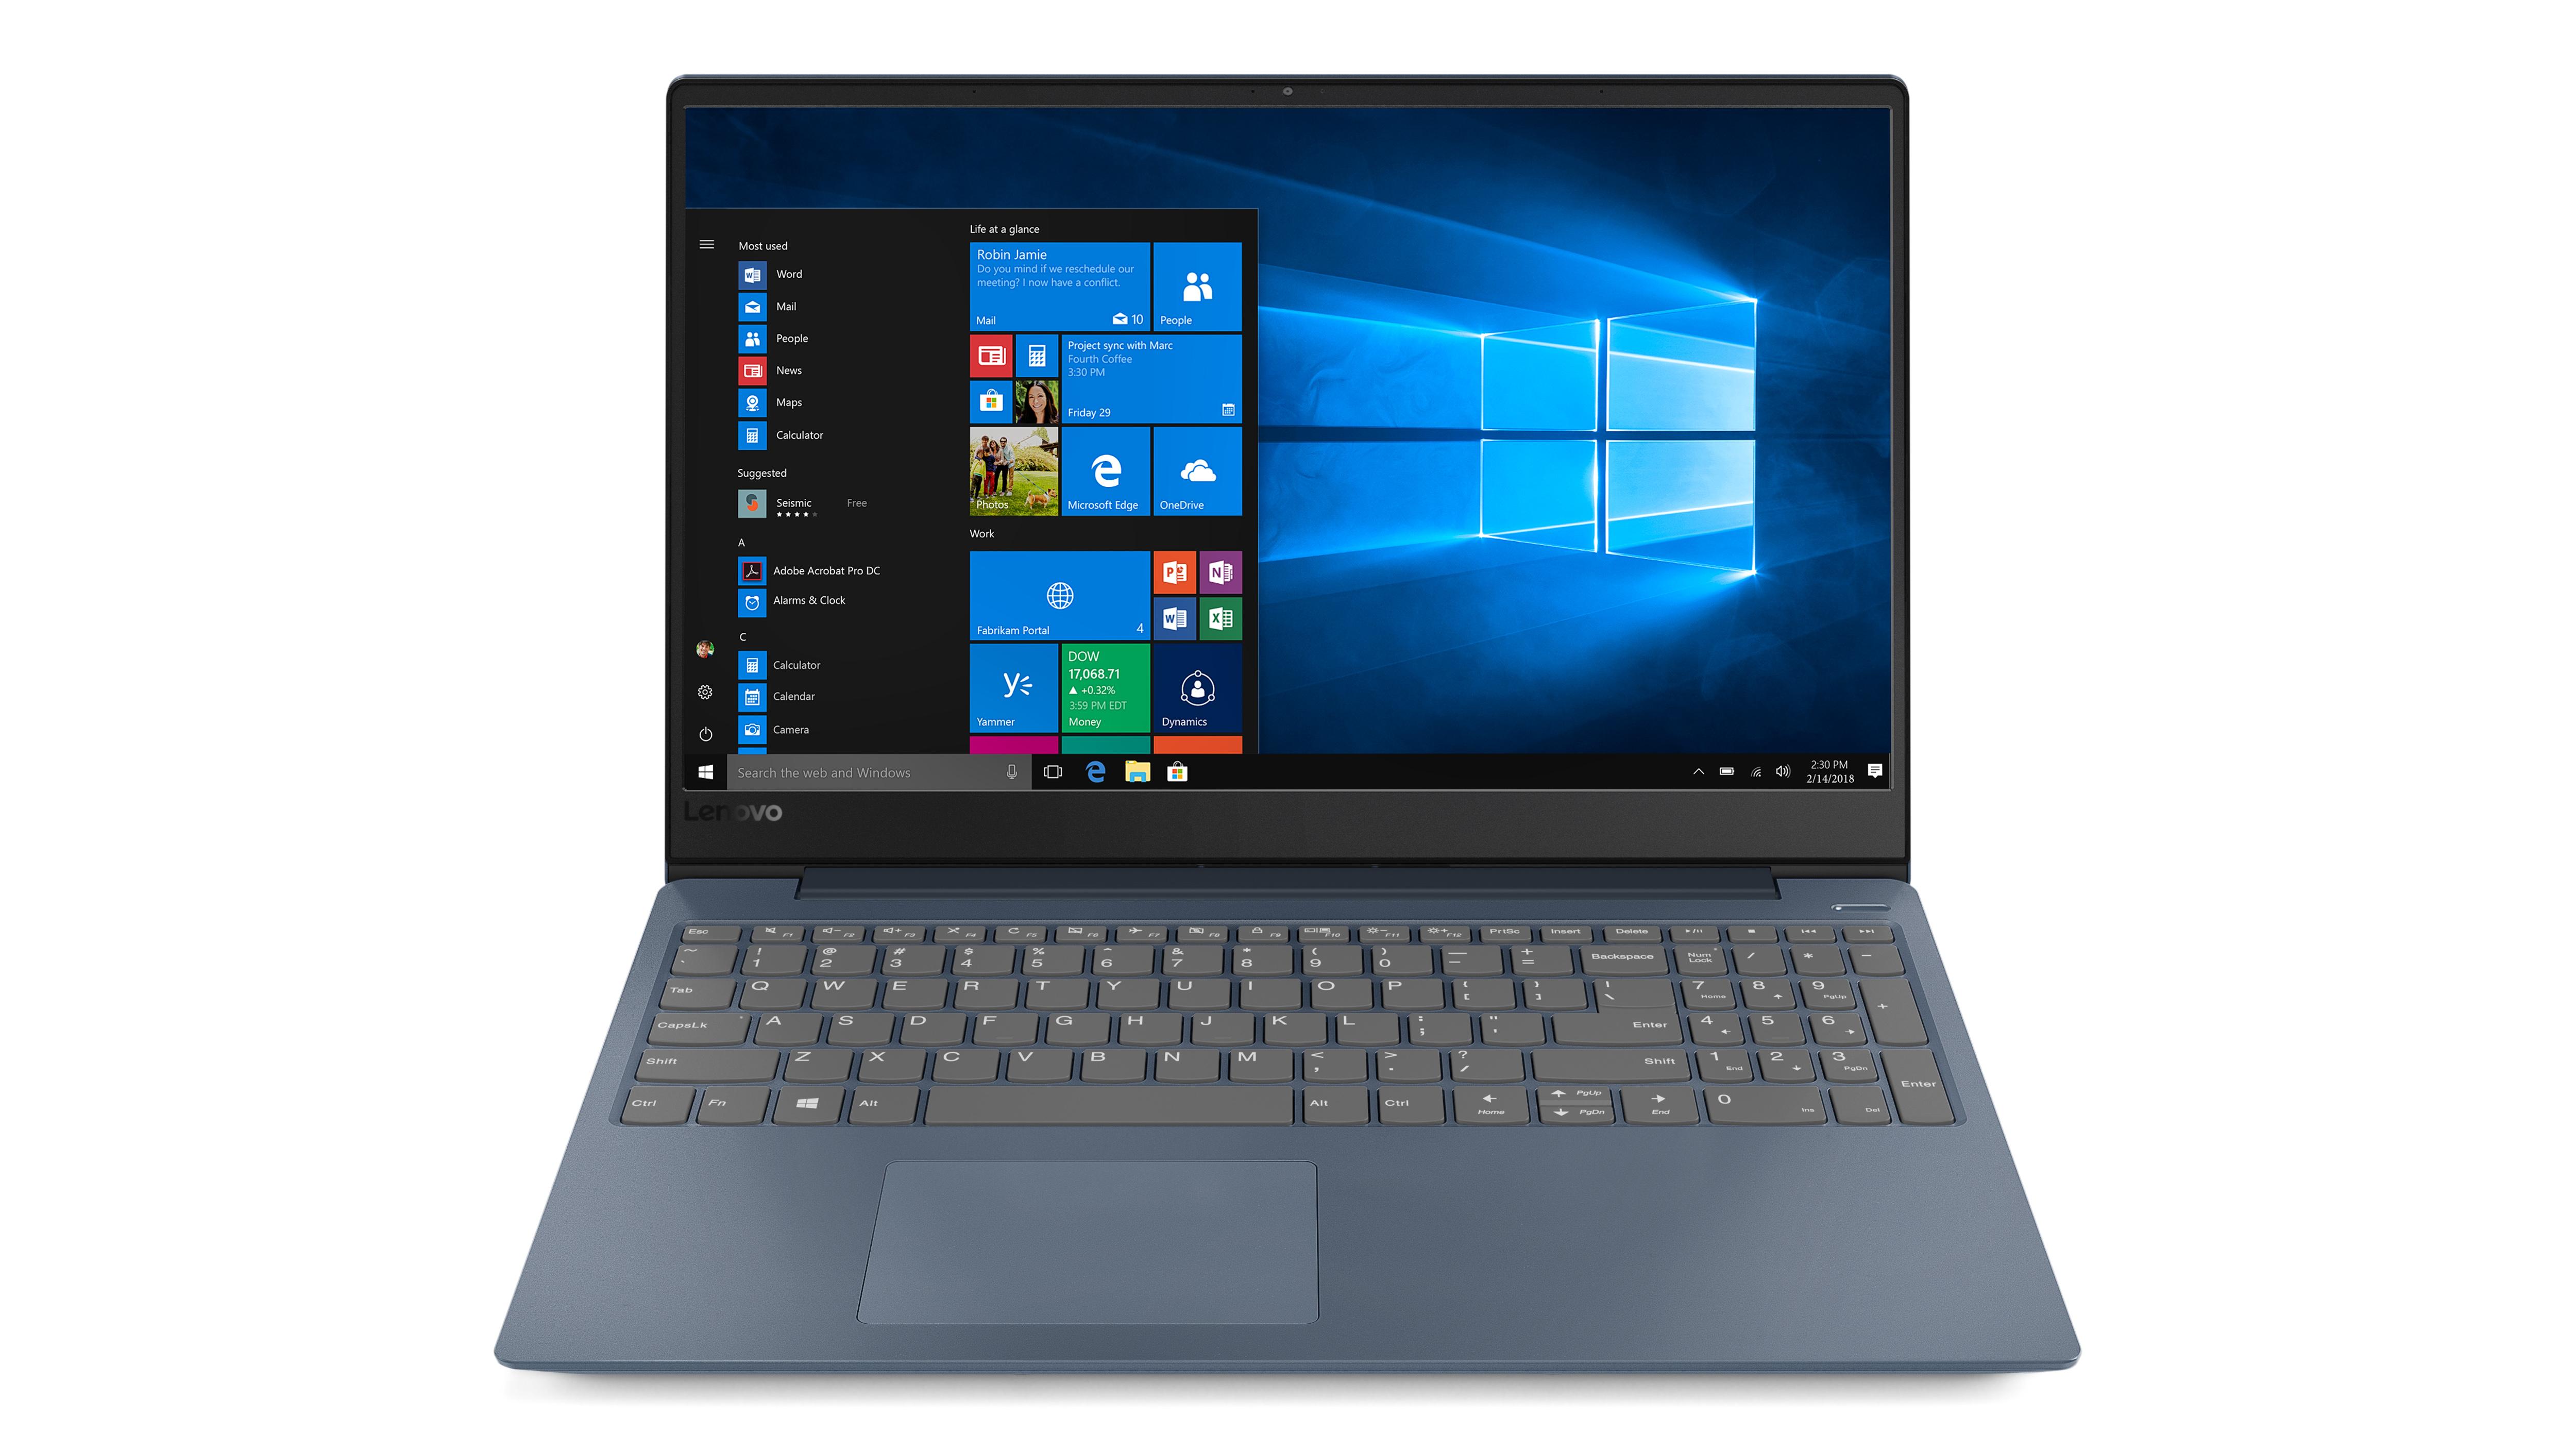 Lenovo Ideapad 330S: 15.6'' 768P IPS, i5-8250U, 4GB DDR4, 16GB Intel Optane + 1TB HDD, Type-C, Win10H @ $379 + F/S